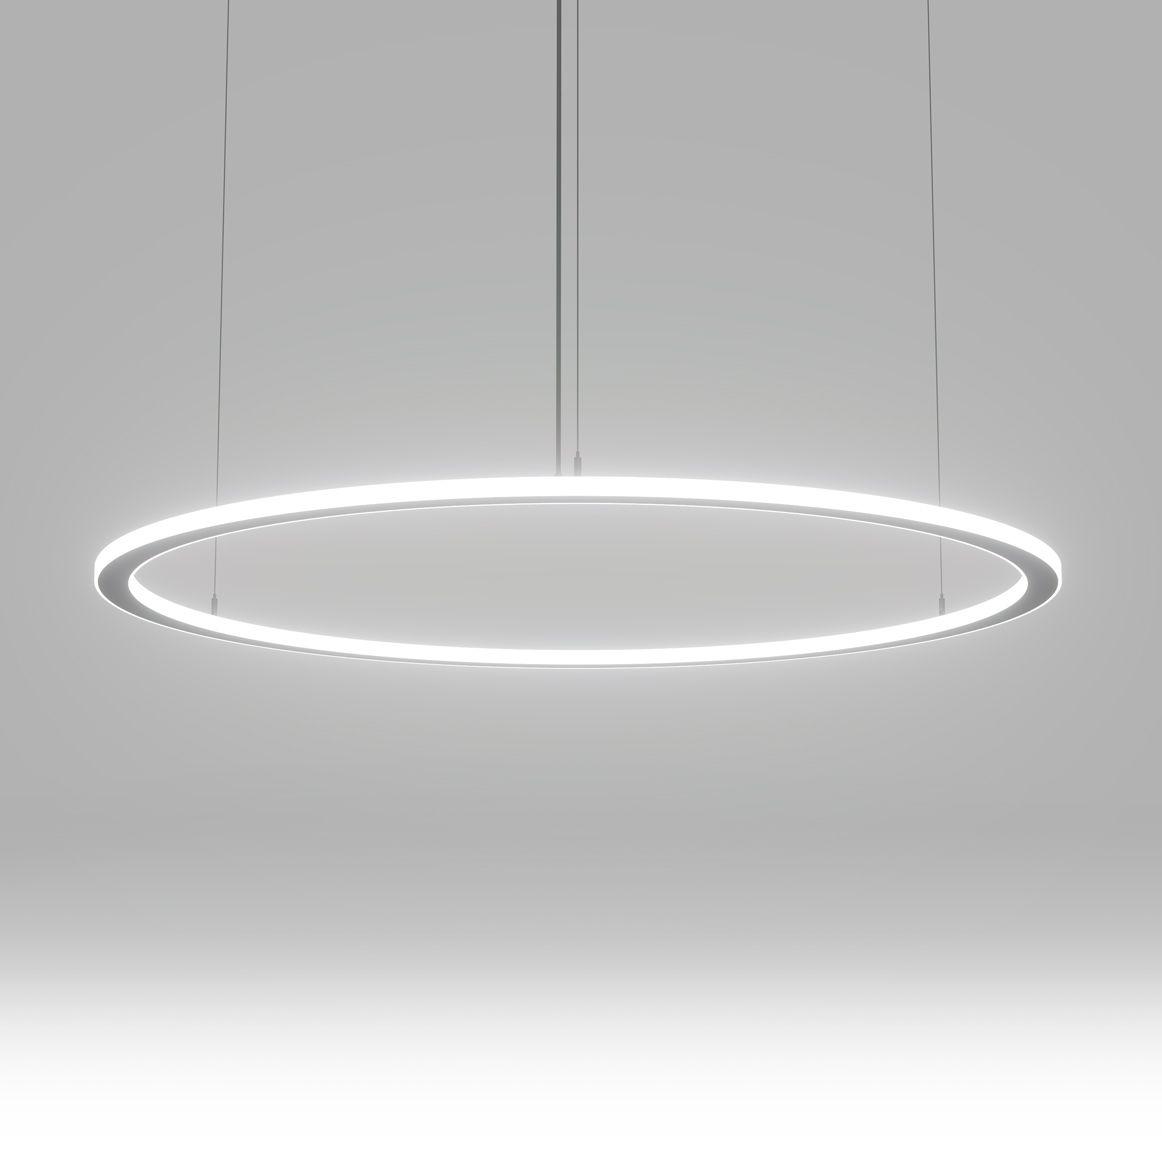 Suspended Round Pendant Led Light